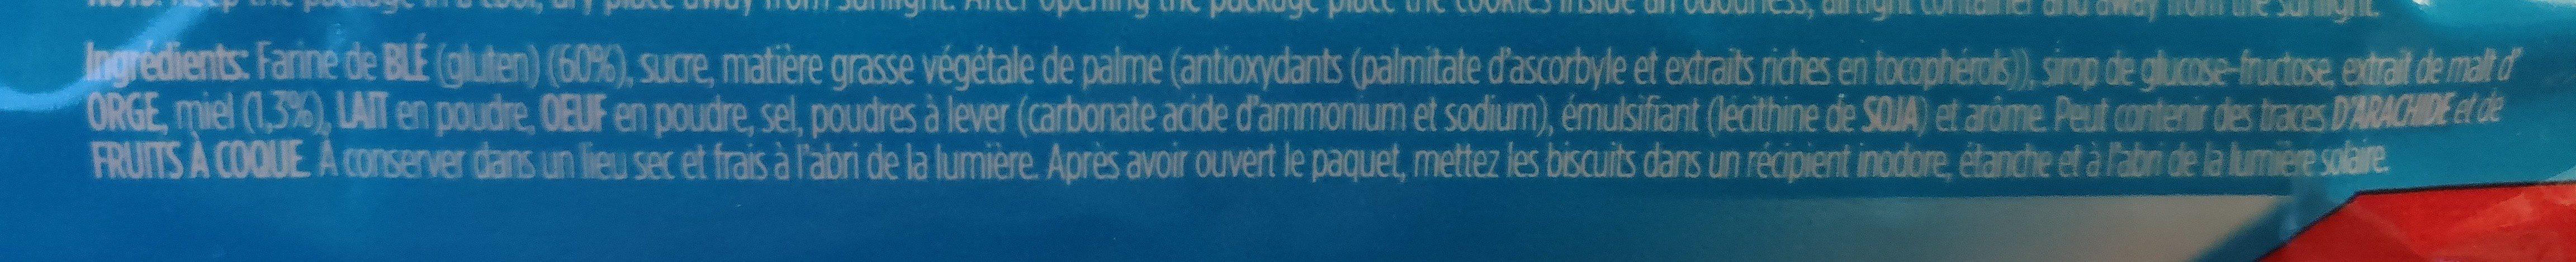 Alfa Biscuit - Ingrediënten - fr